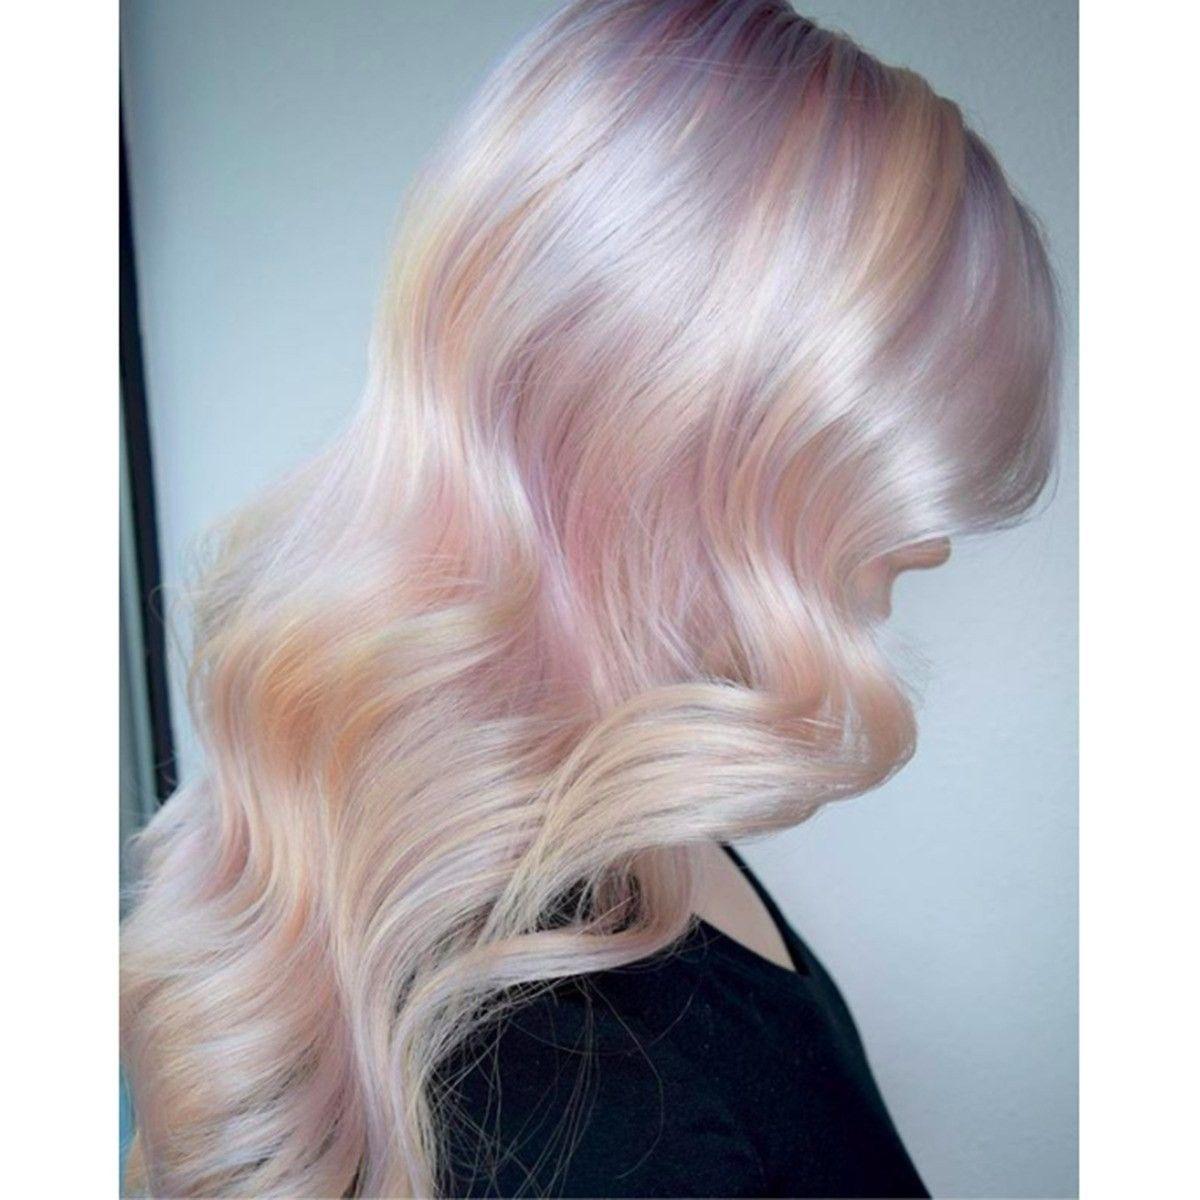 Pin By April Platt On Hair In 2019 2018 Hair Color Trends Blonde Dye Hair Trends